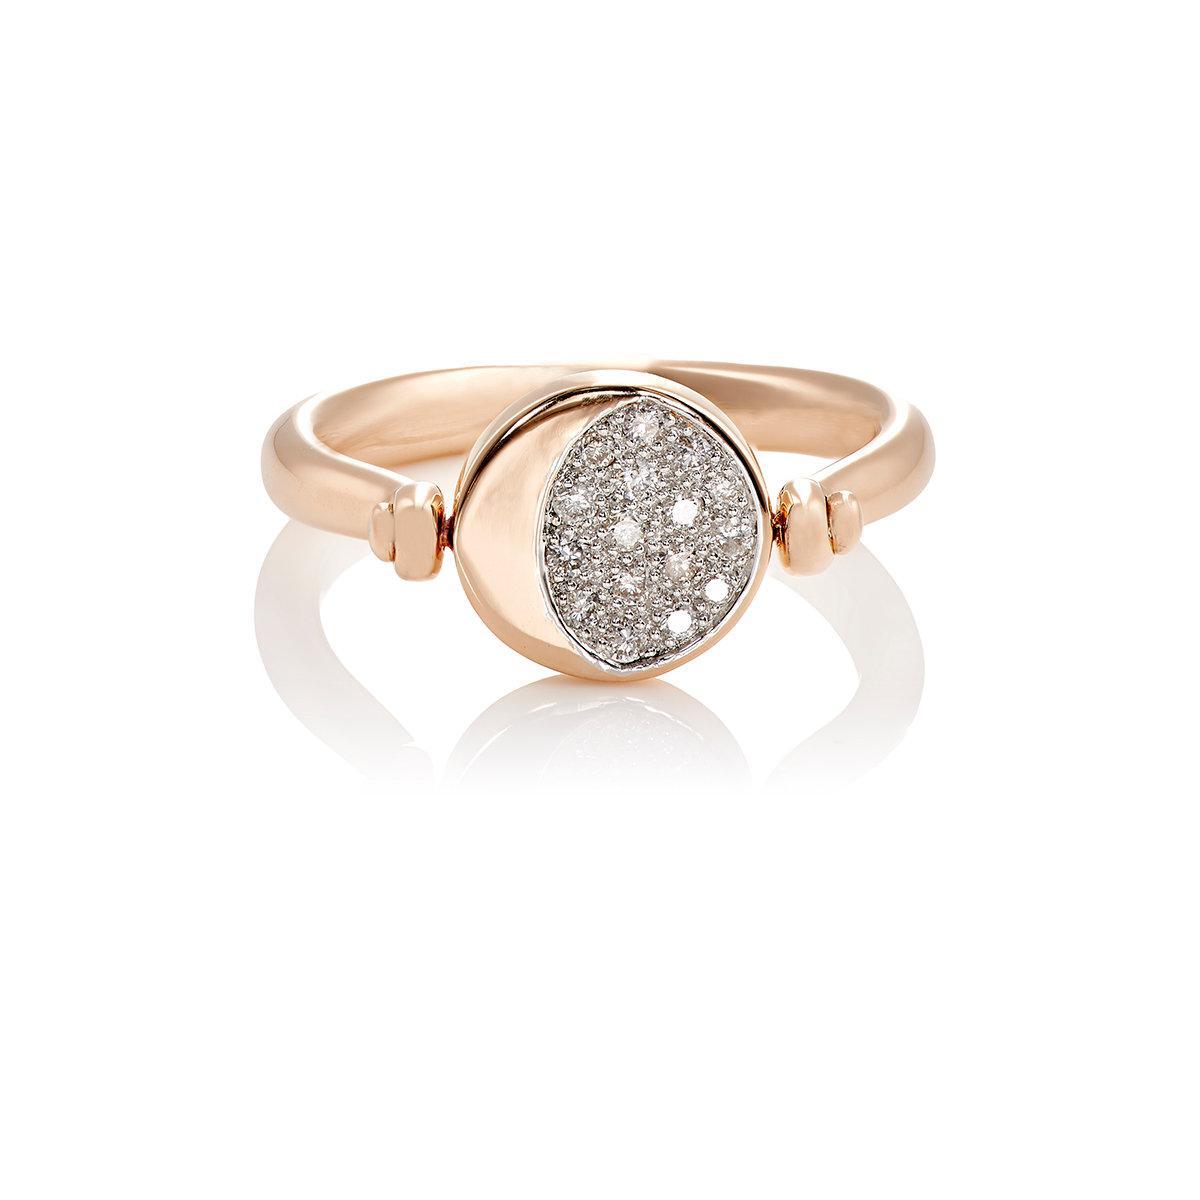 Pamela Love reversible moon phase ring Buy Cheap Popular Limit Discount Popular Sale Online wkGPVB